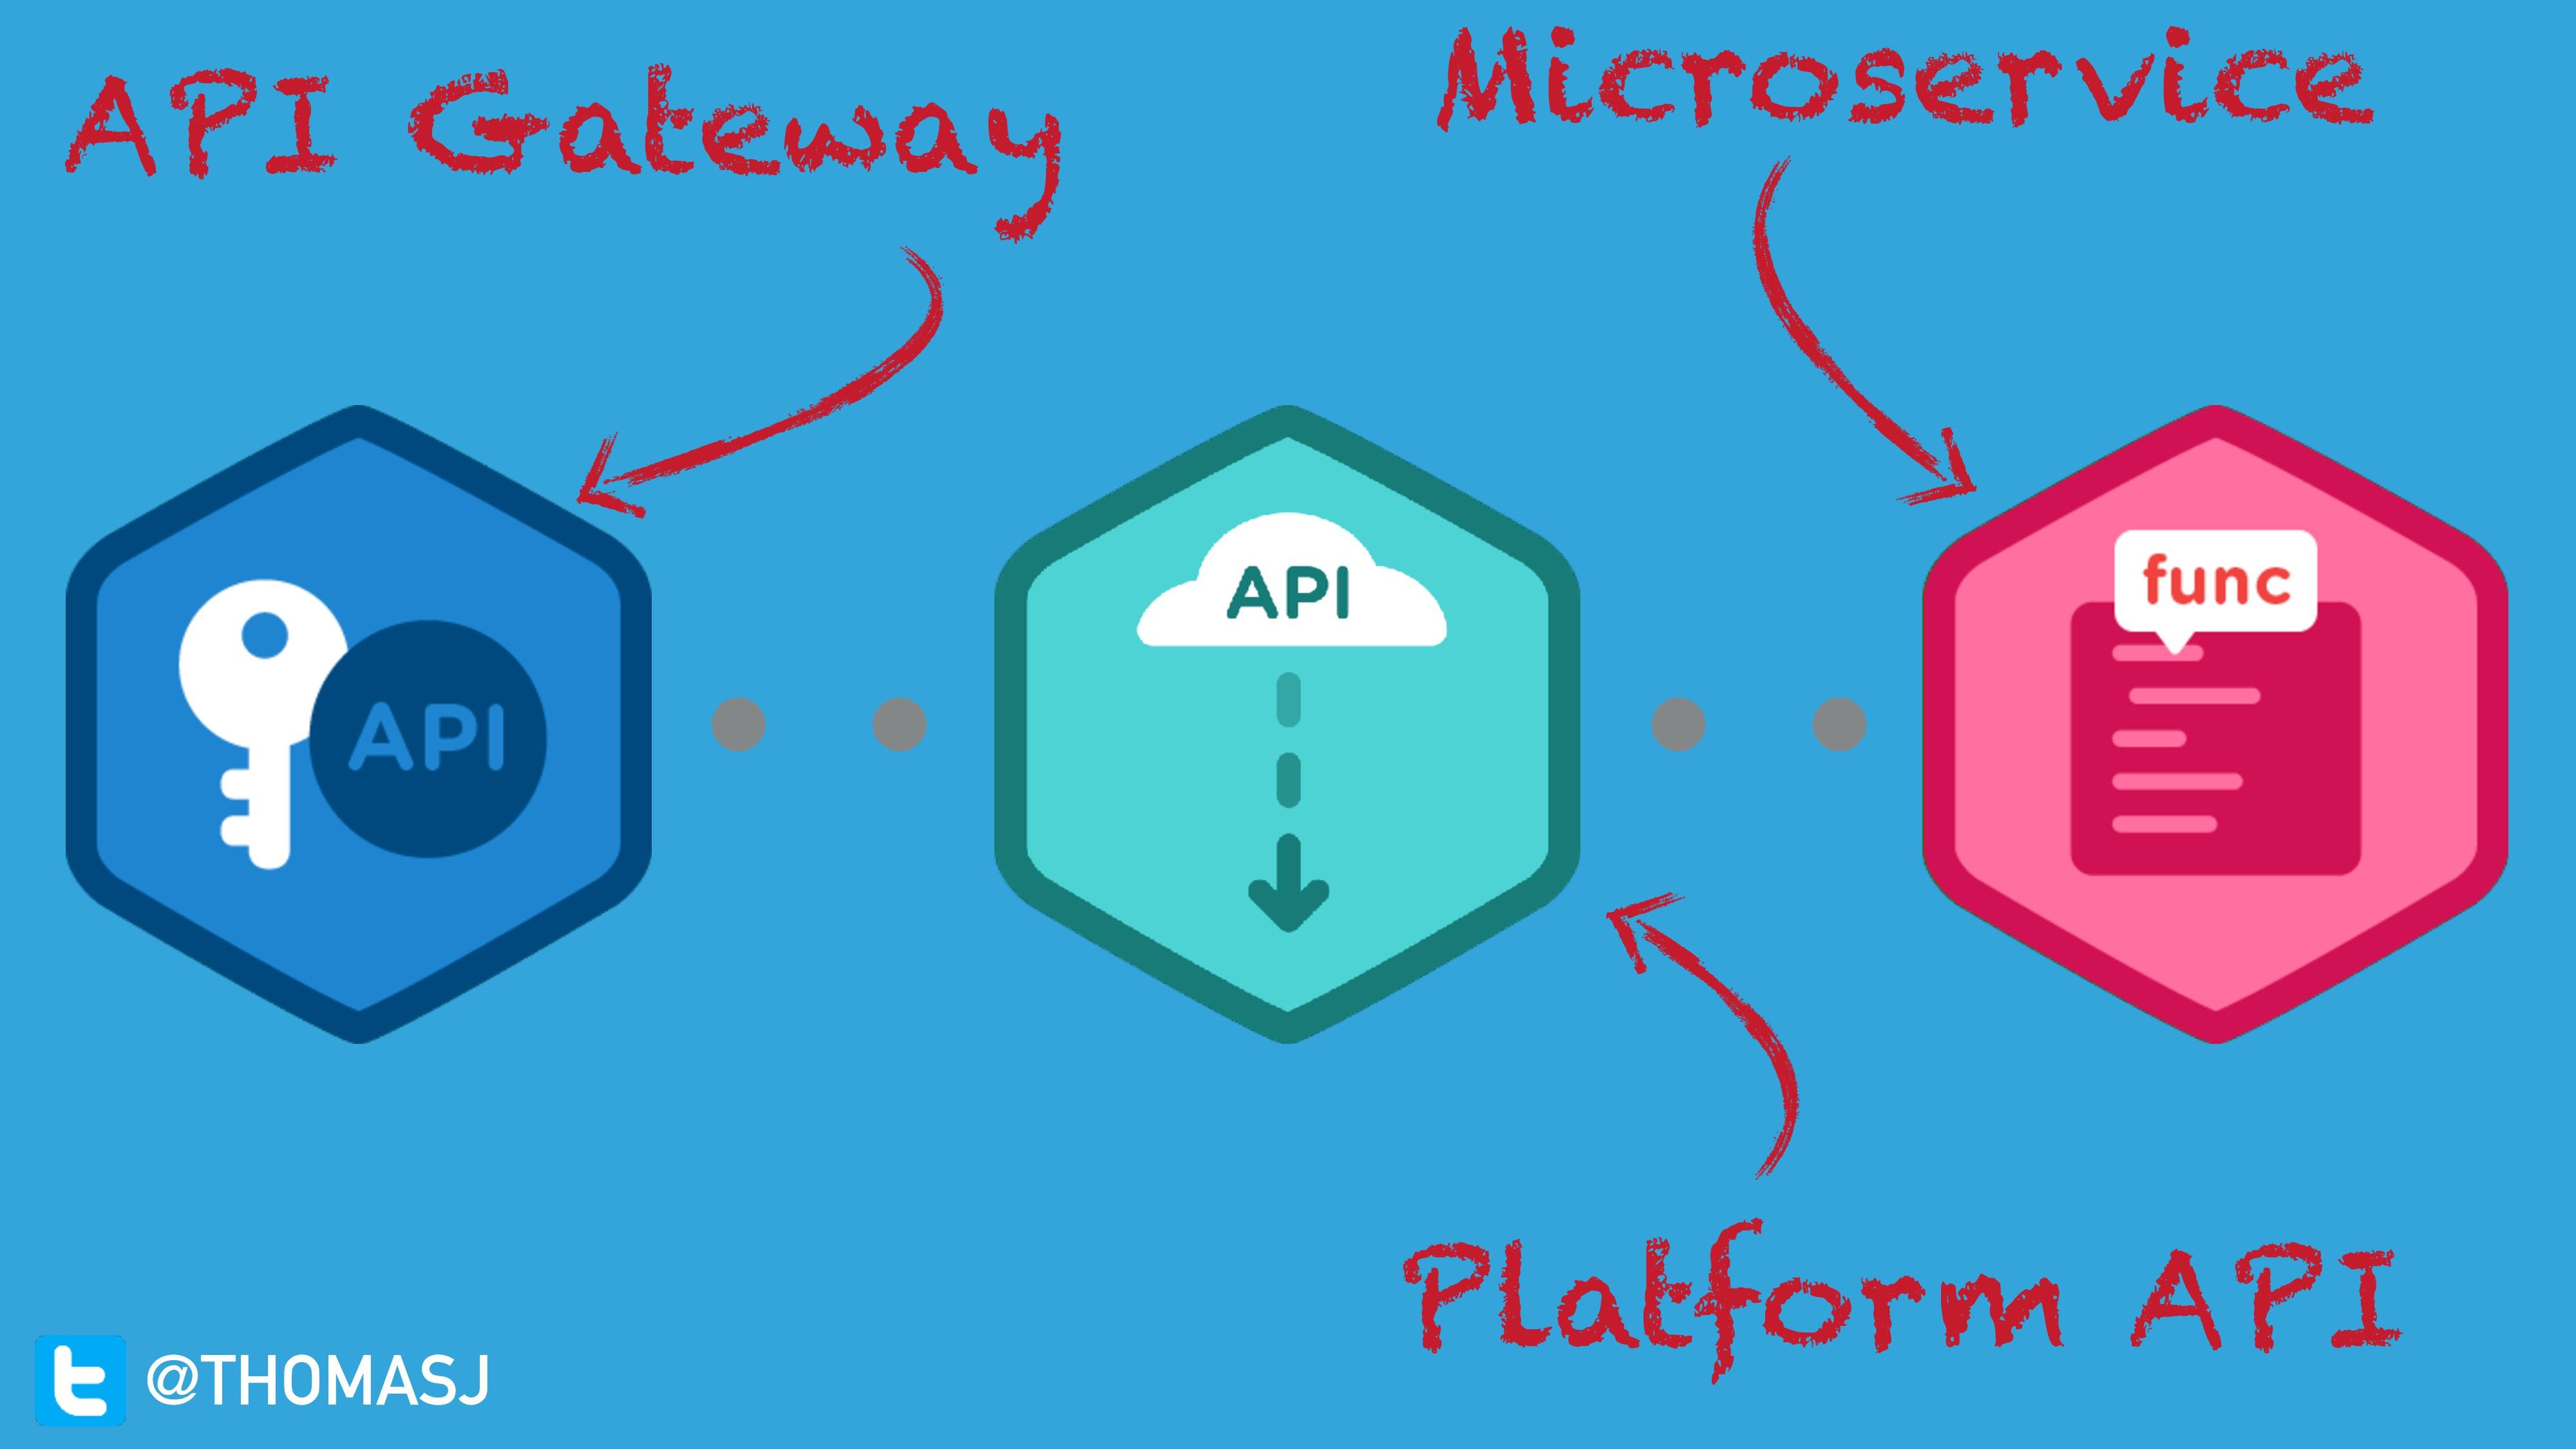 Platform API API Gateway Microservice @THOMASJ